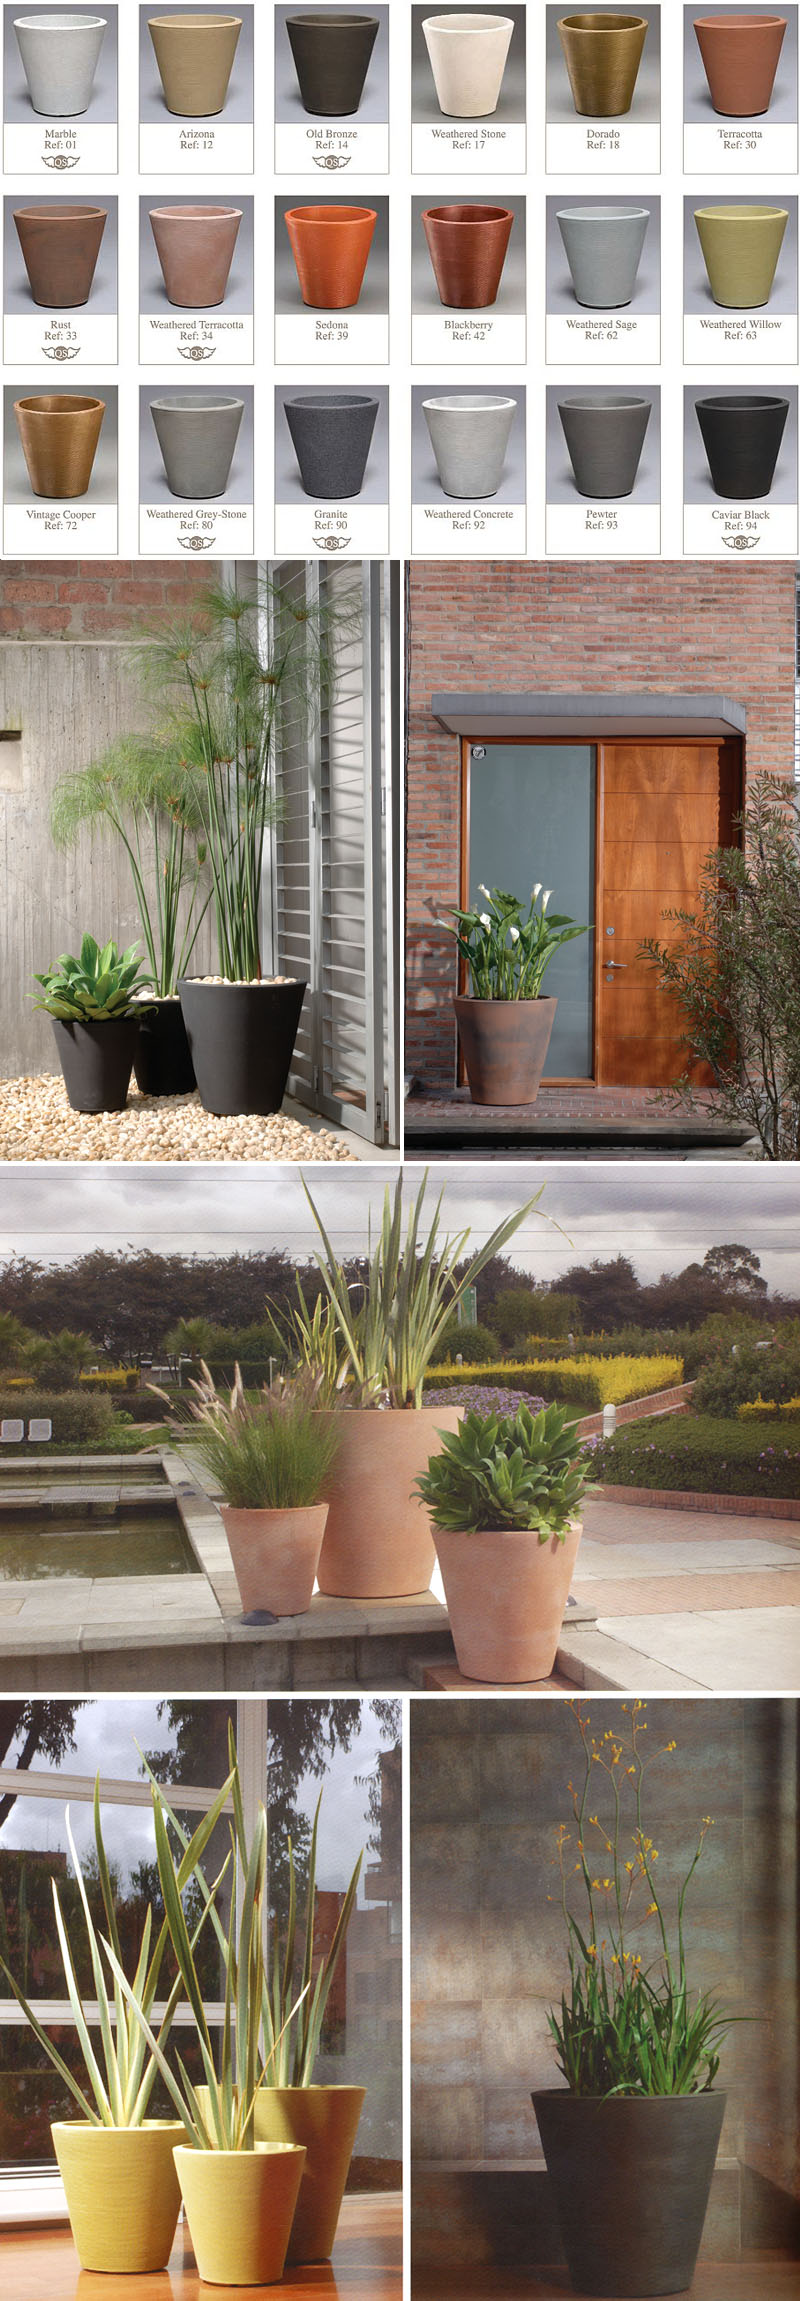 modern planters madison planter  inch height x  inch width  - modern planters madison planter  inch height x  inch width